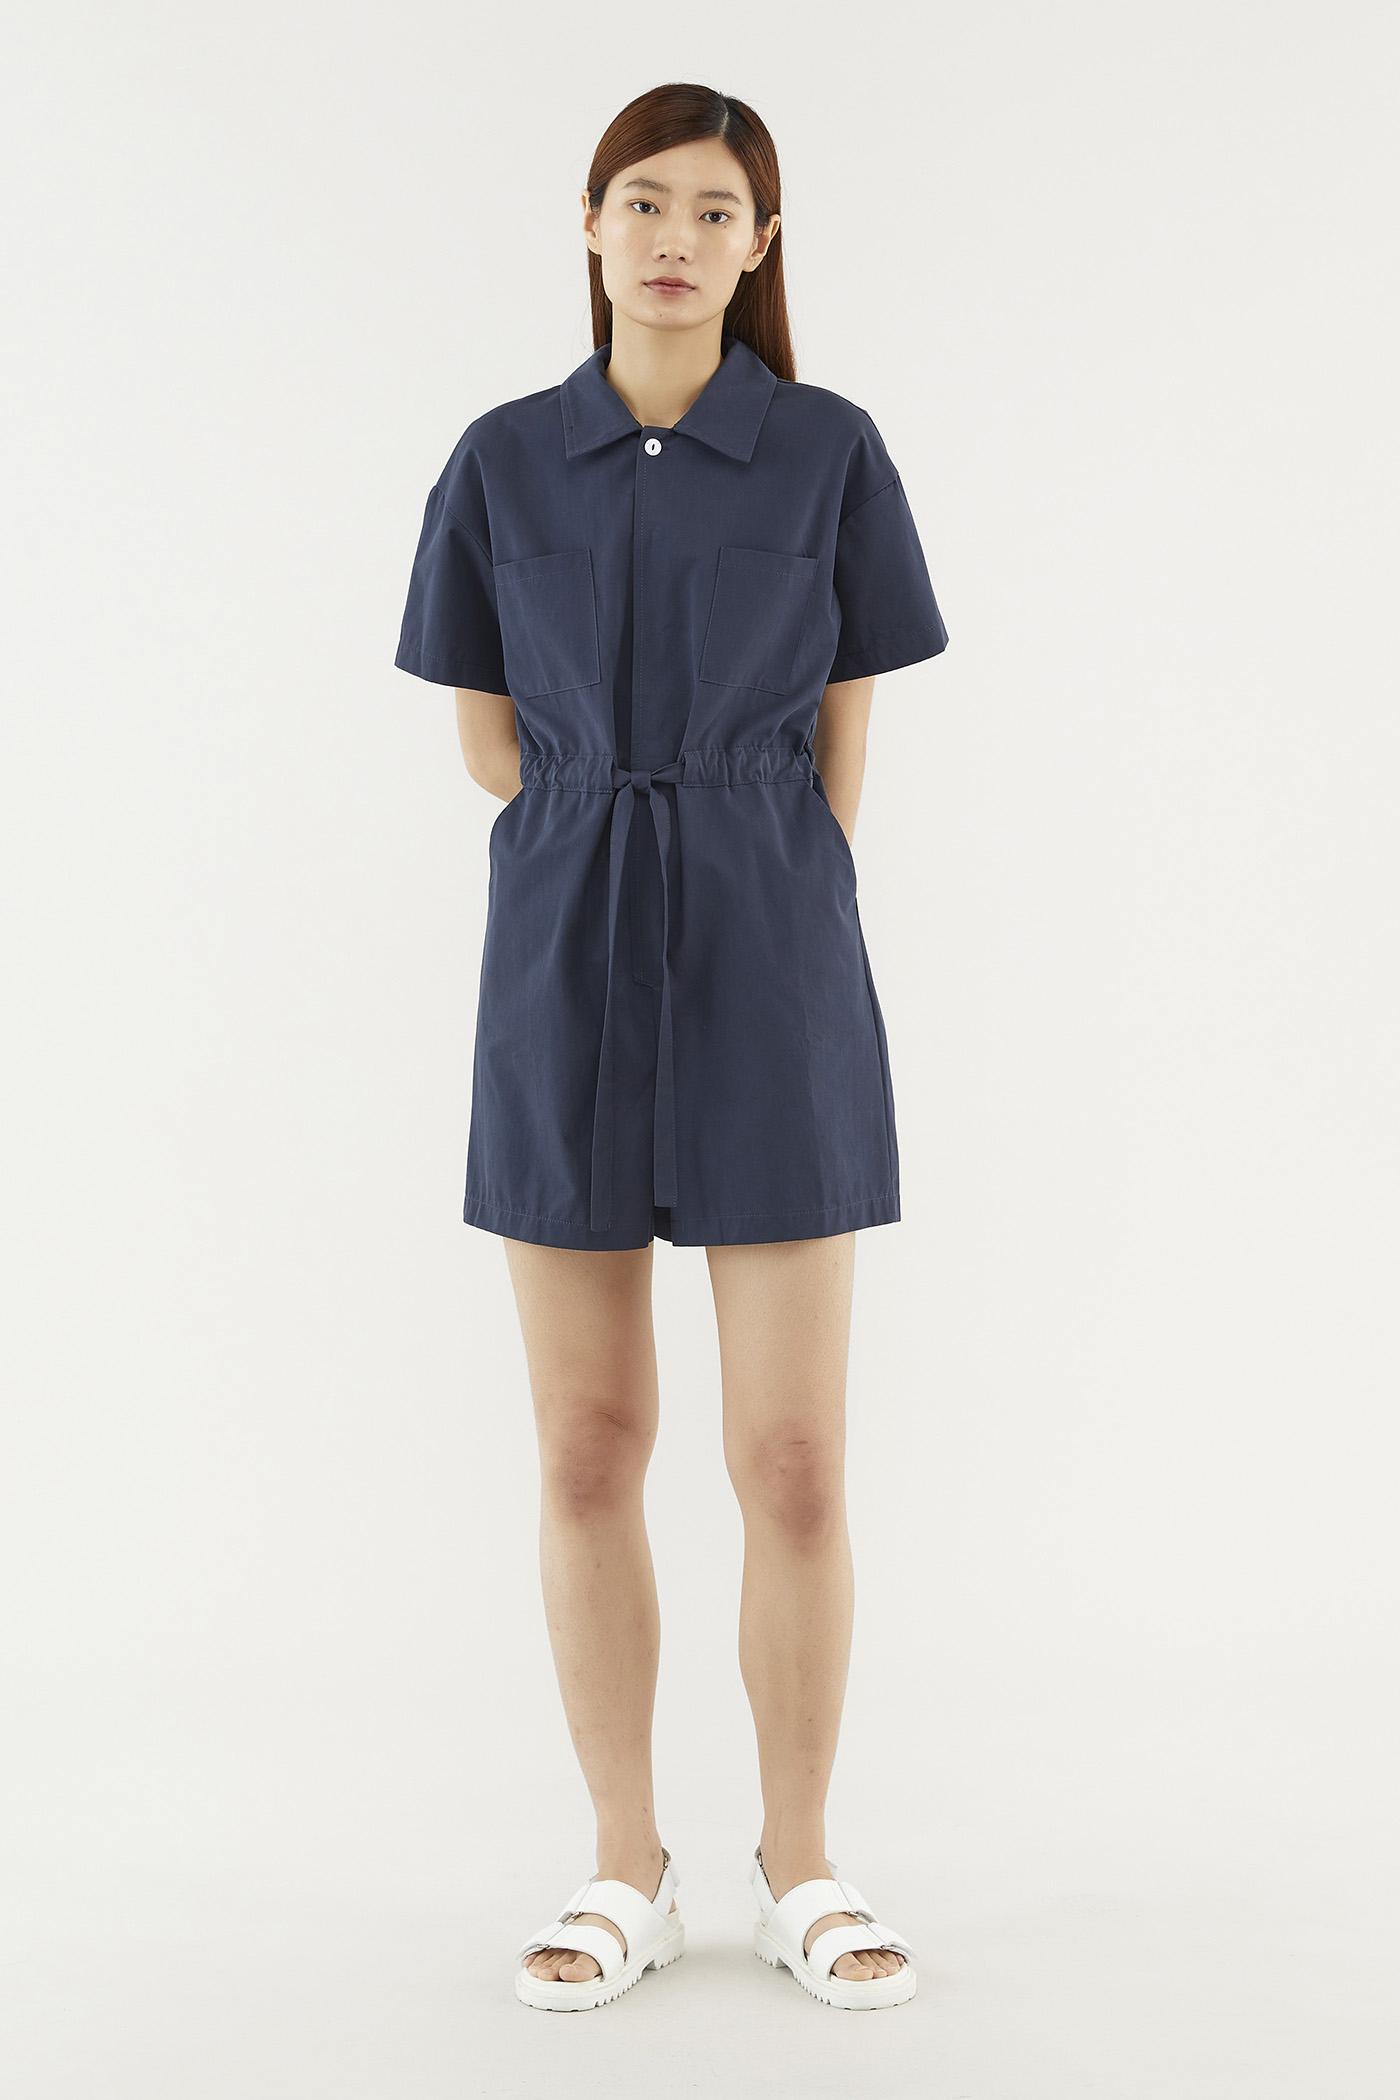 Kynlee Shirt Jumpsuit